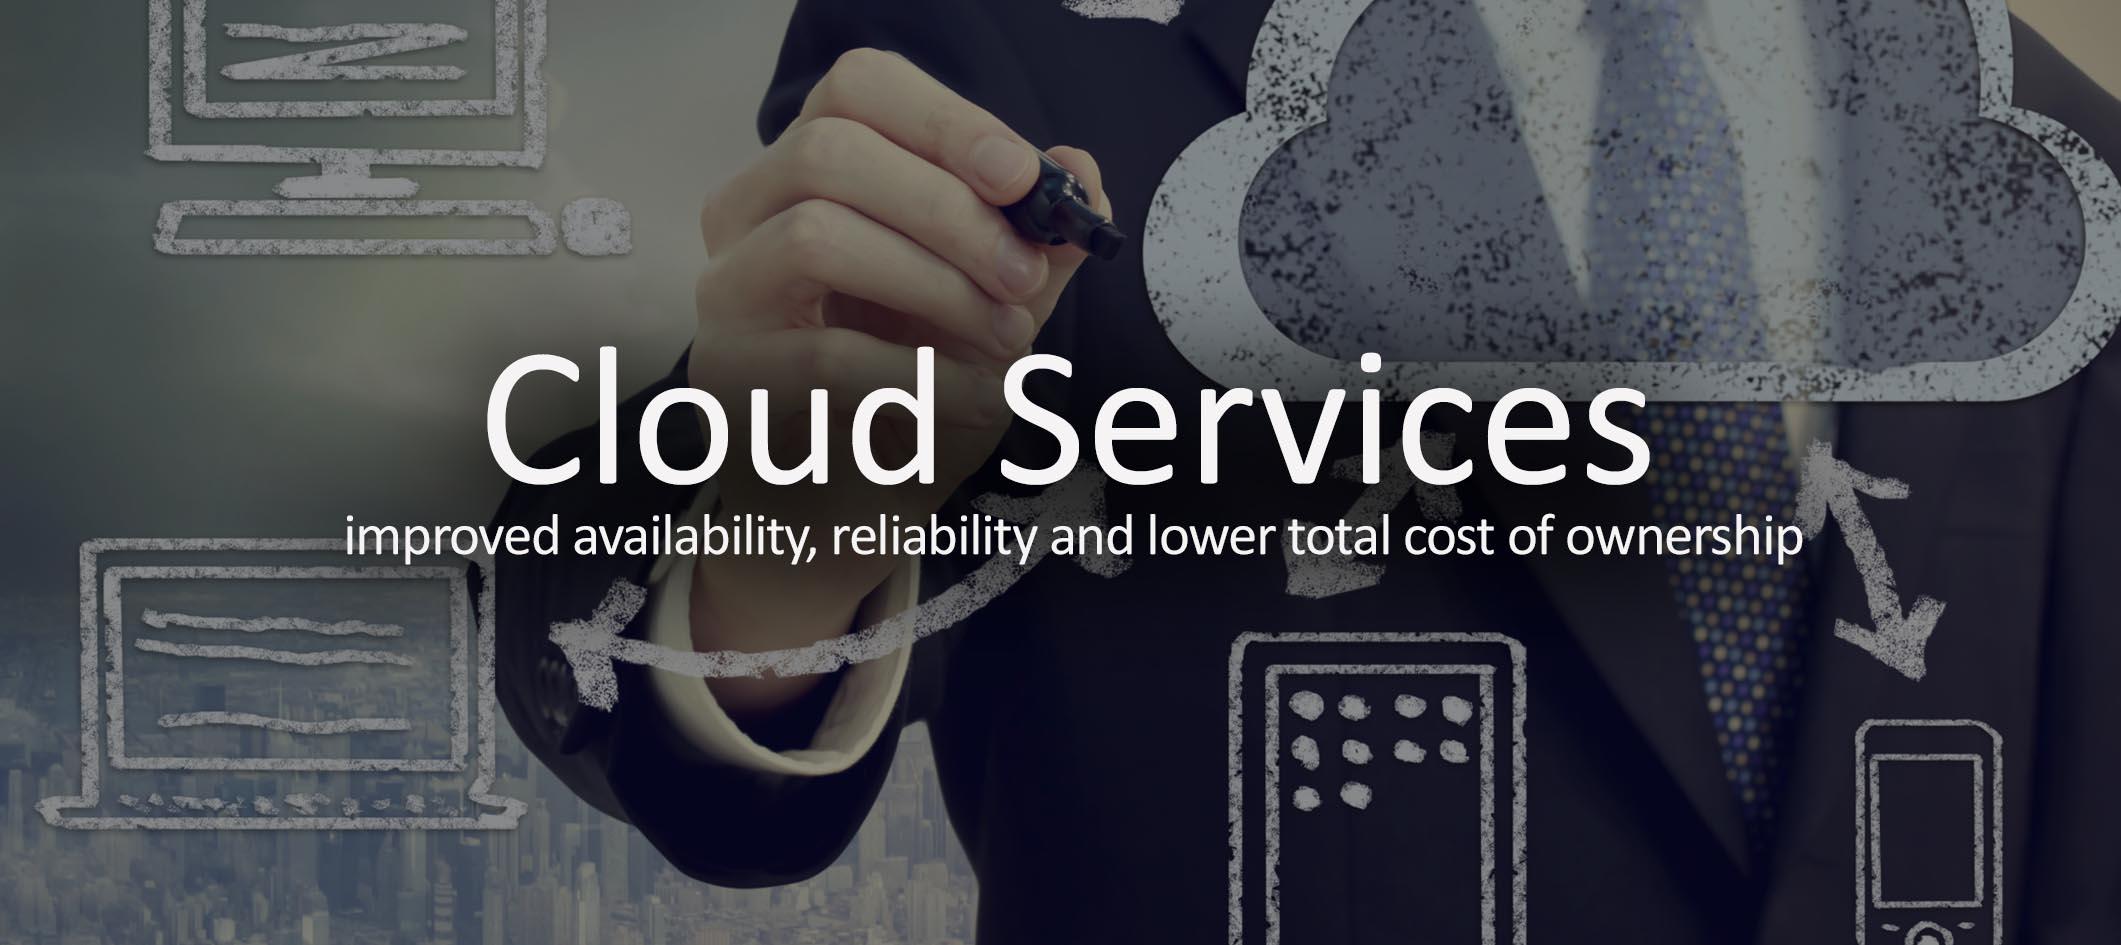 Cloud Servies